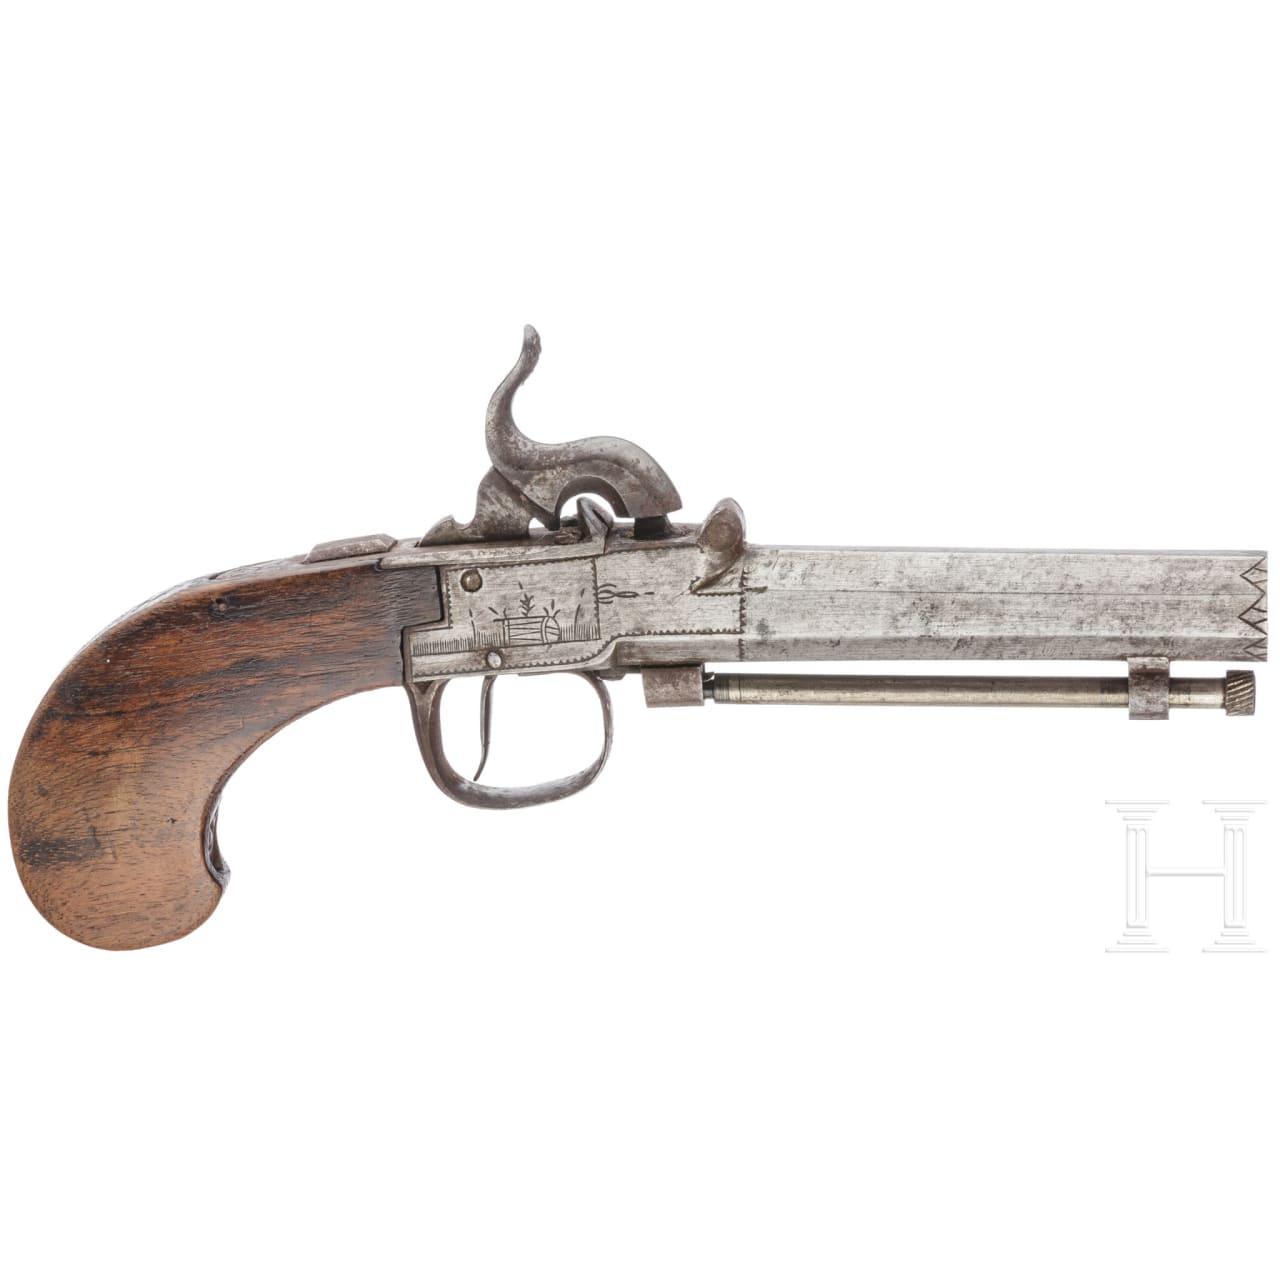 A percussion pistol, Germany (?), circa 1840